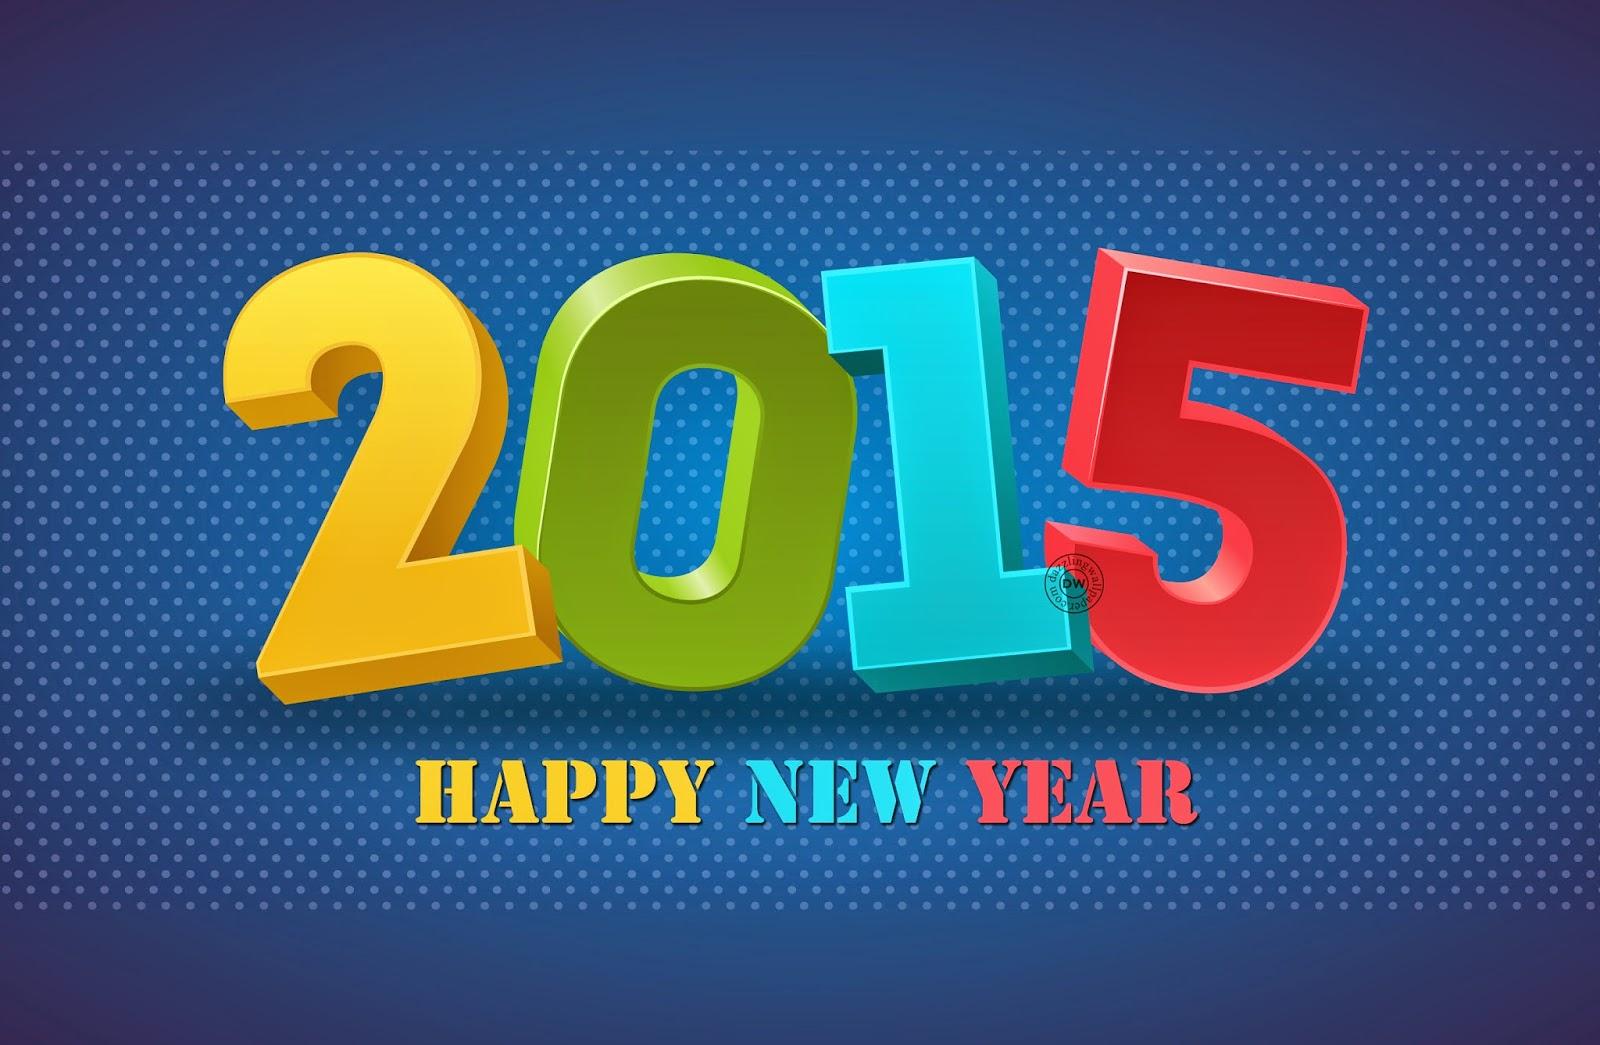 Wallpaper Happy New Year 2015 BBM Whatsapp